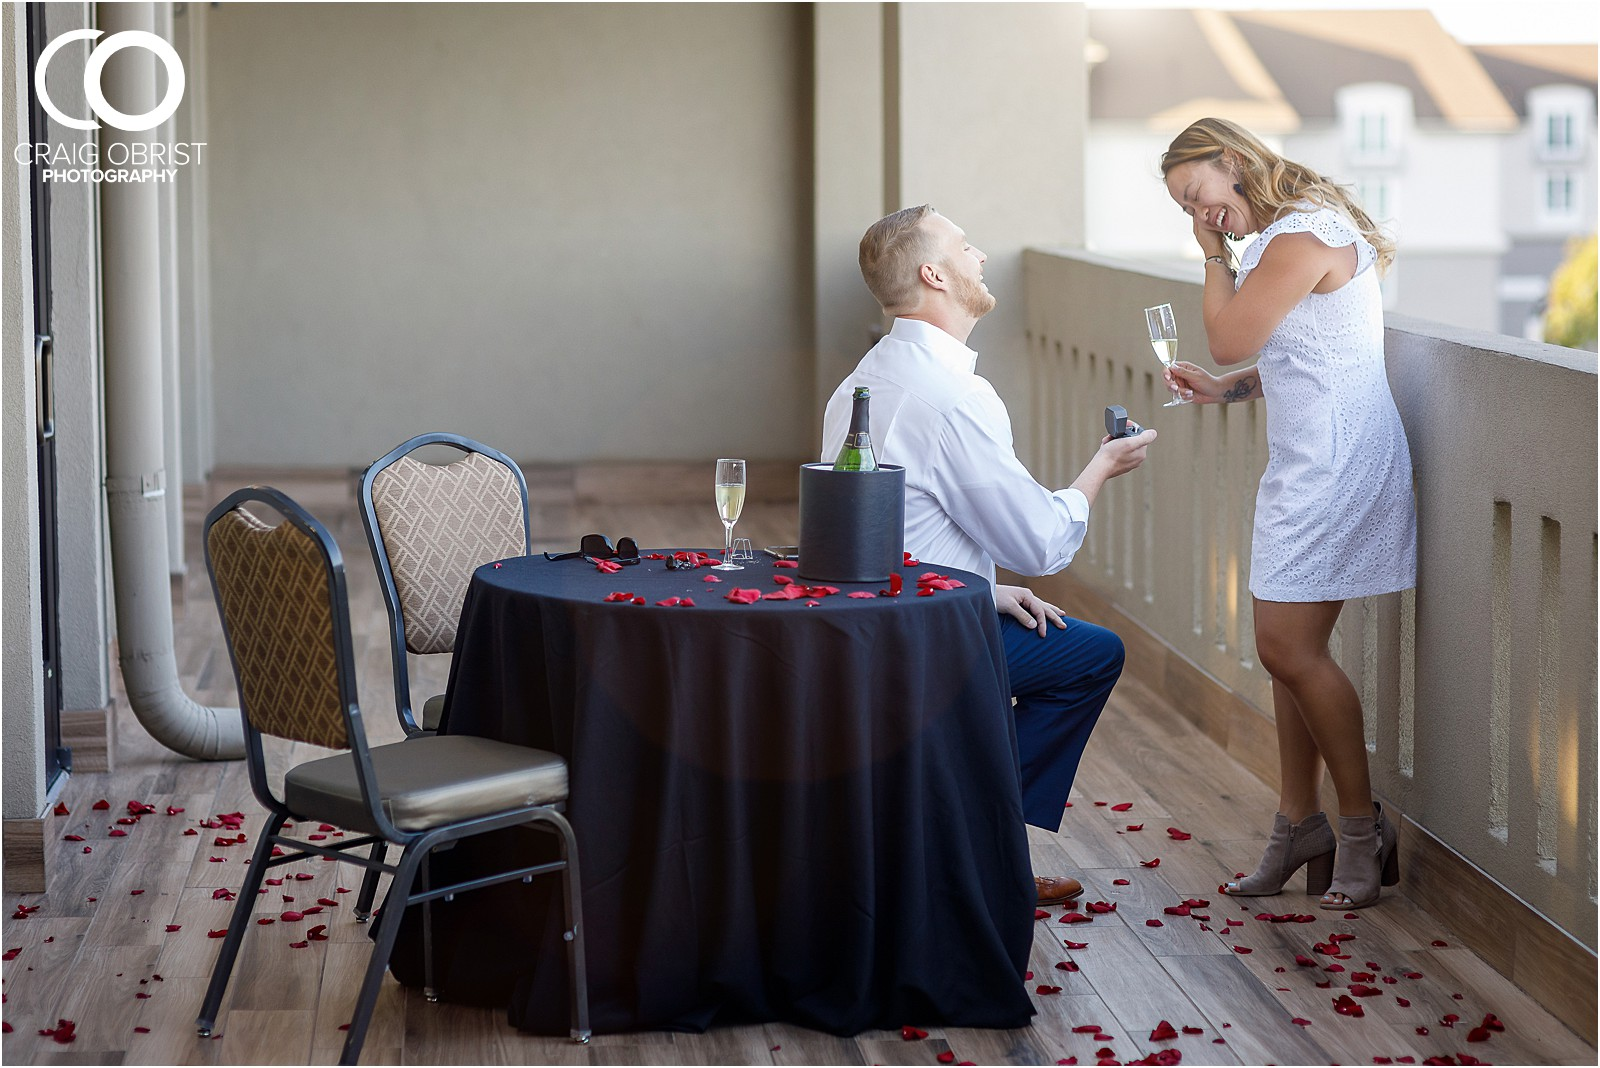 Chateau Elan Winery Surprise Engagement Portraits_0002.jpg